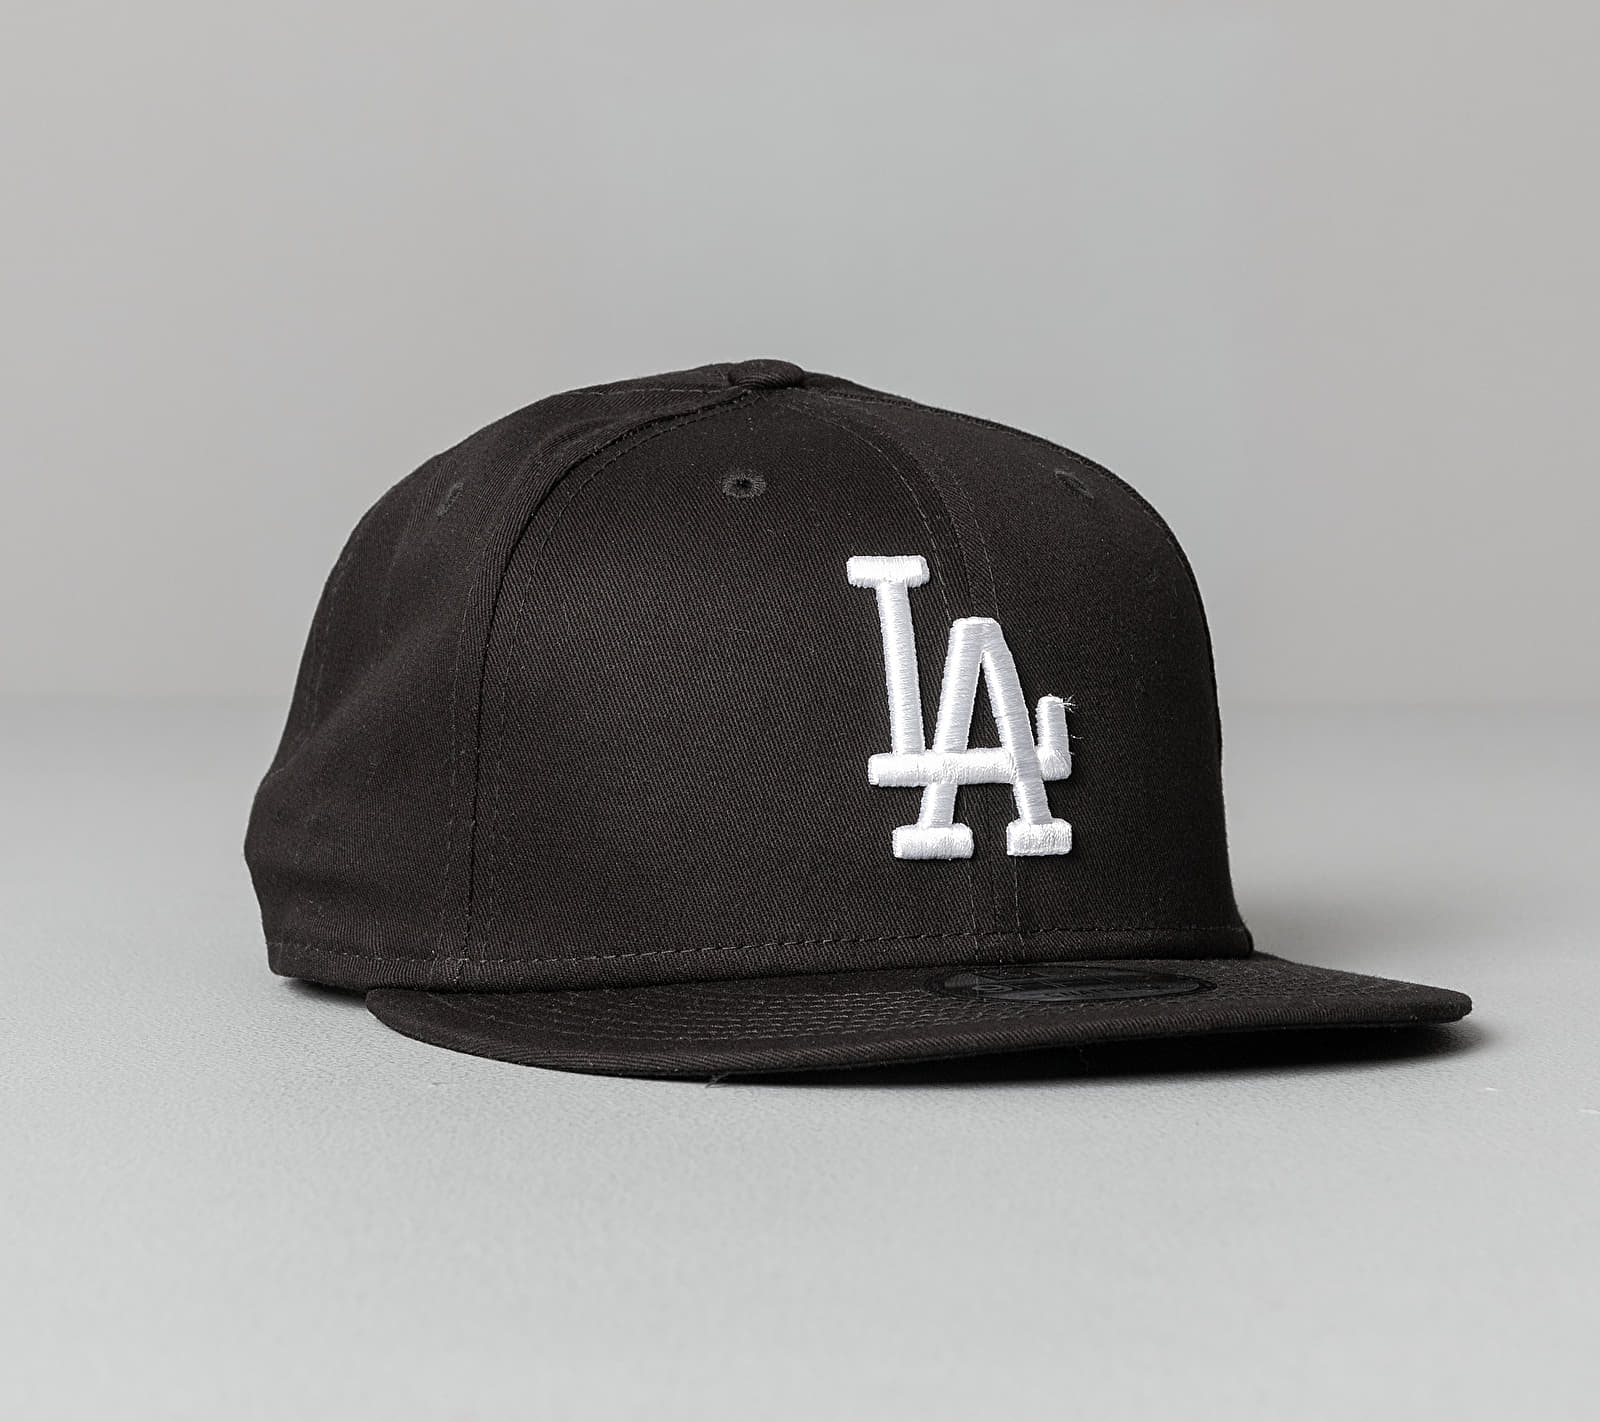 New Era 9Fifty MLB Essential Los Angeles Dodgers Cap Black S/M